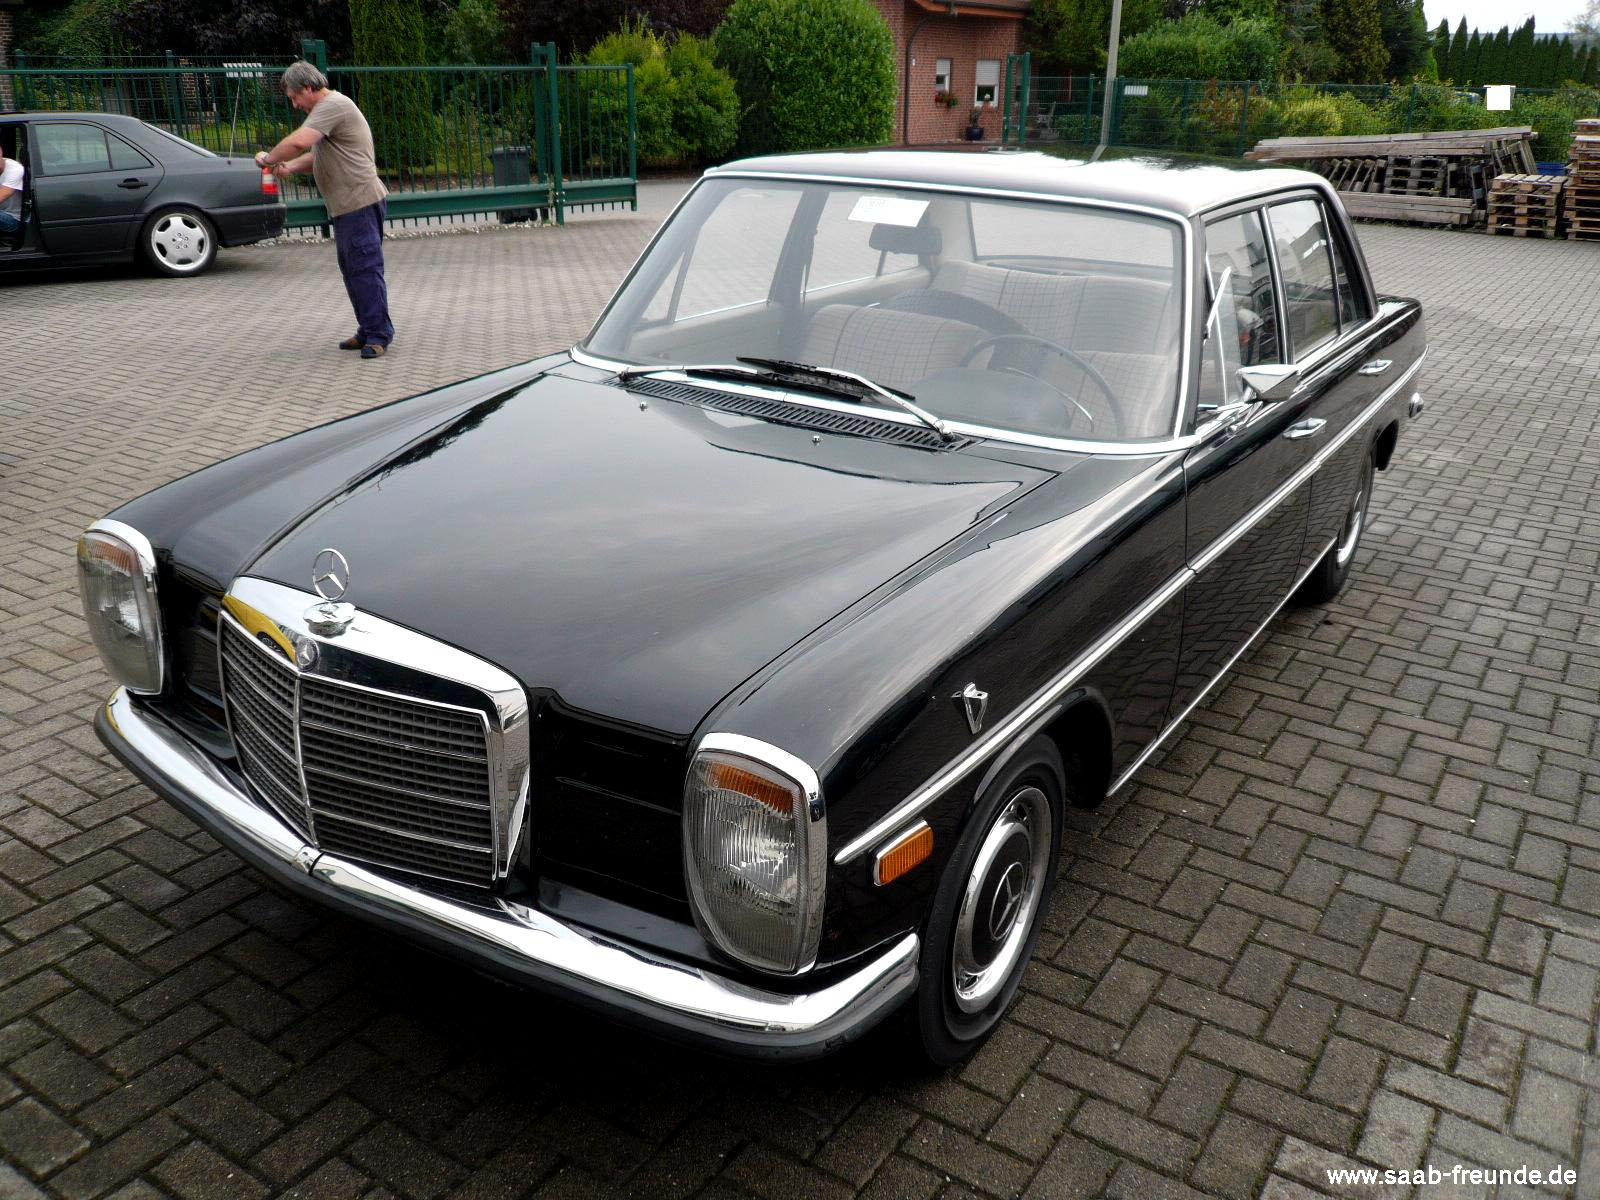 Mercedes-Benz 220/8 Benzin (W115) Bauj. 1973